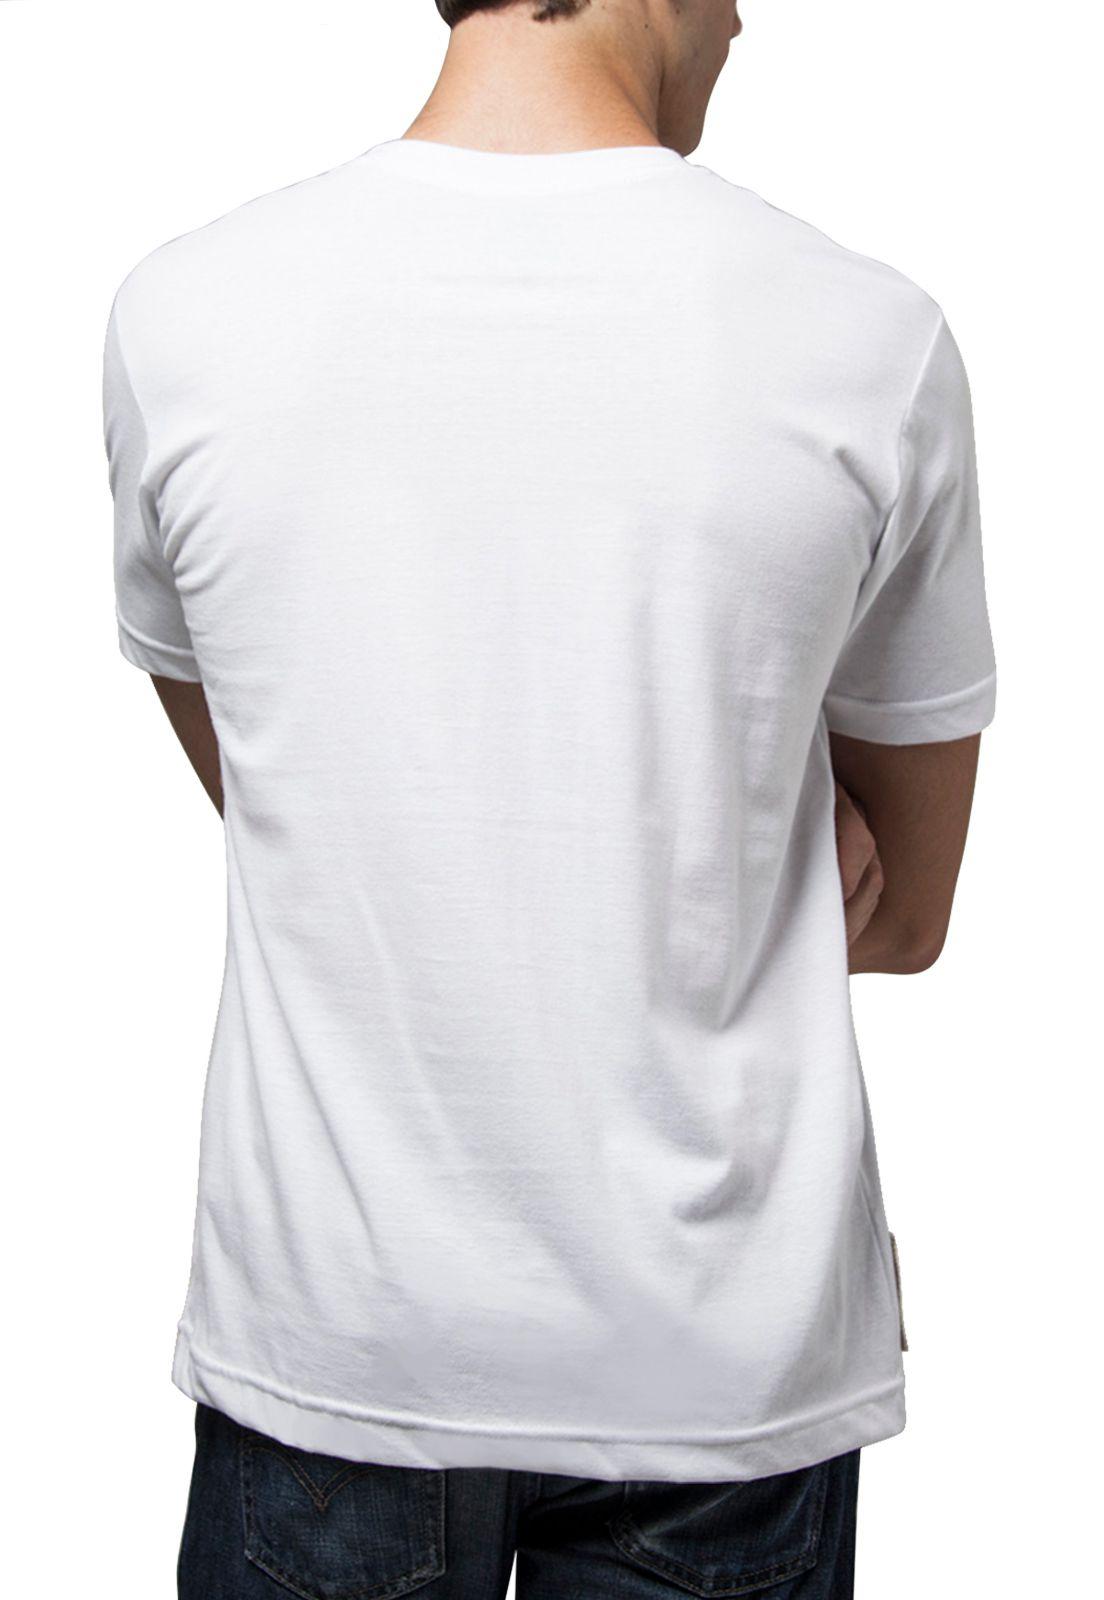 Camiseta Amazônia Maior Felino - Branco